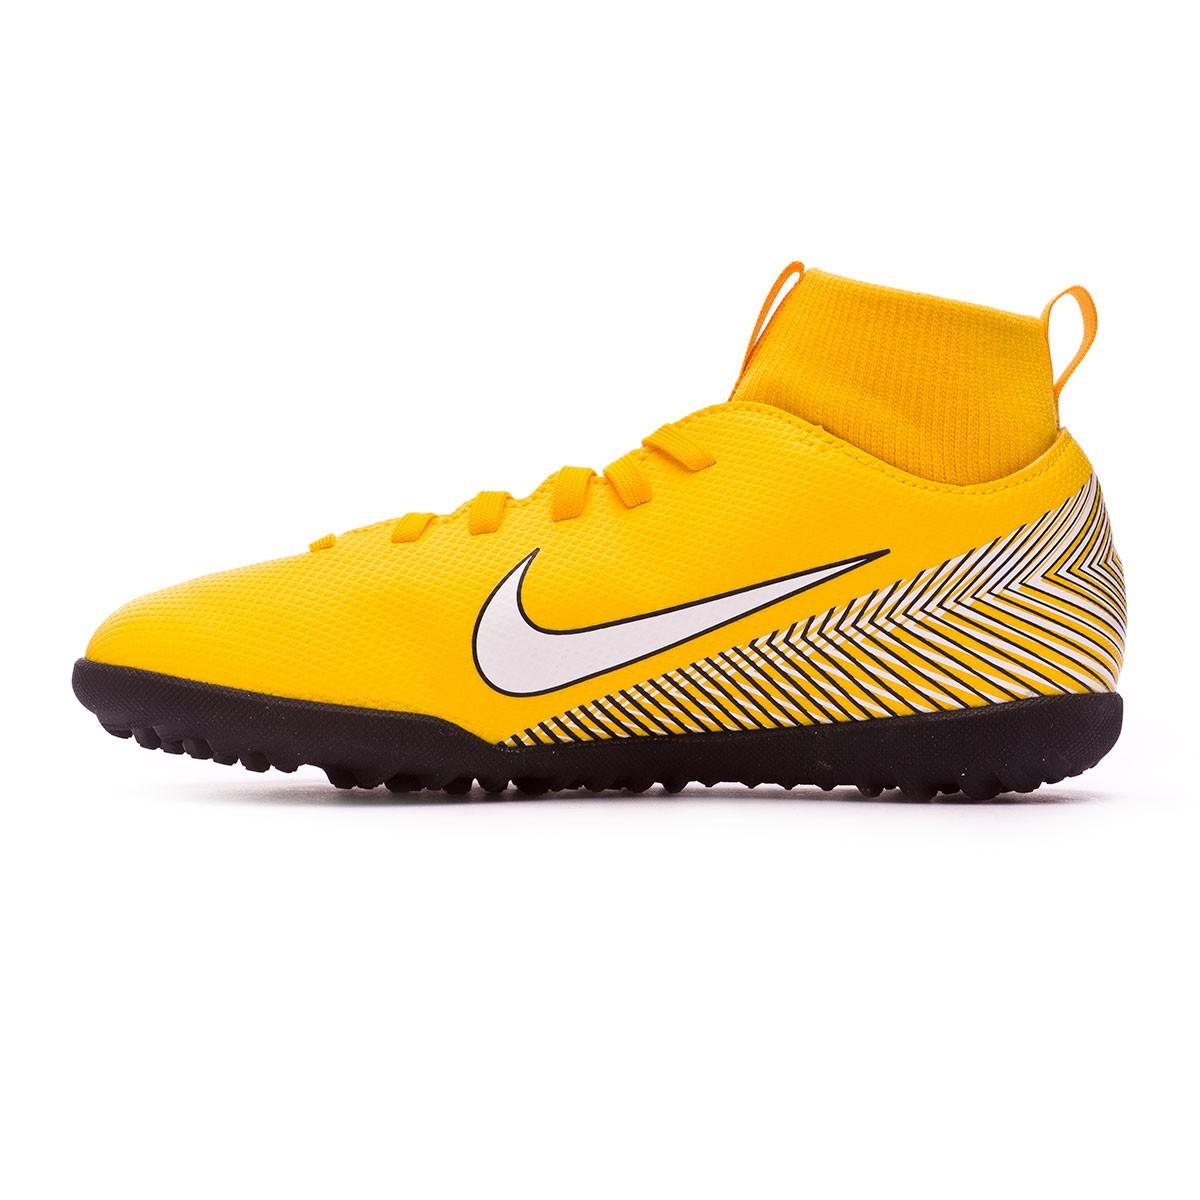 6a1fe74e2c1 Sapatilhas Nike Mercurial SuperflyX VI Club Turf Neymar Crianças  Yellow-Black - Loja de futebol Fútbol Emotion